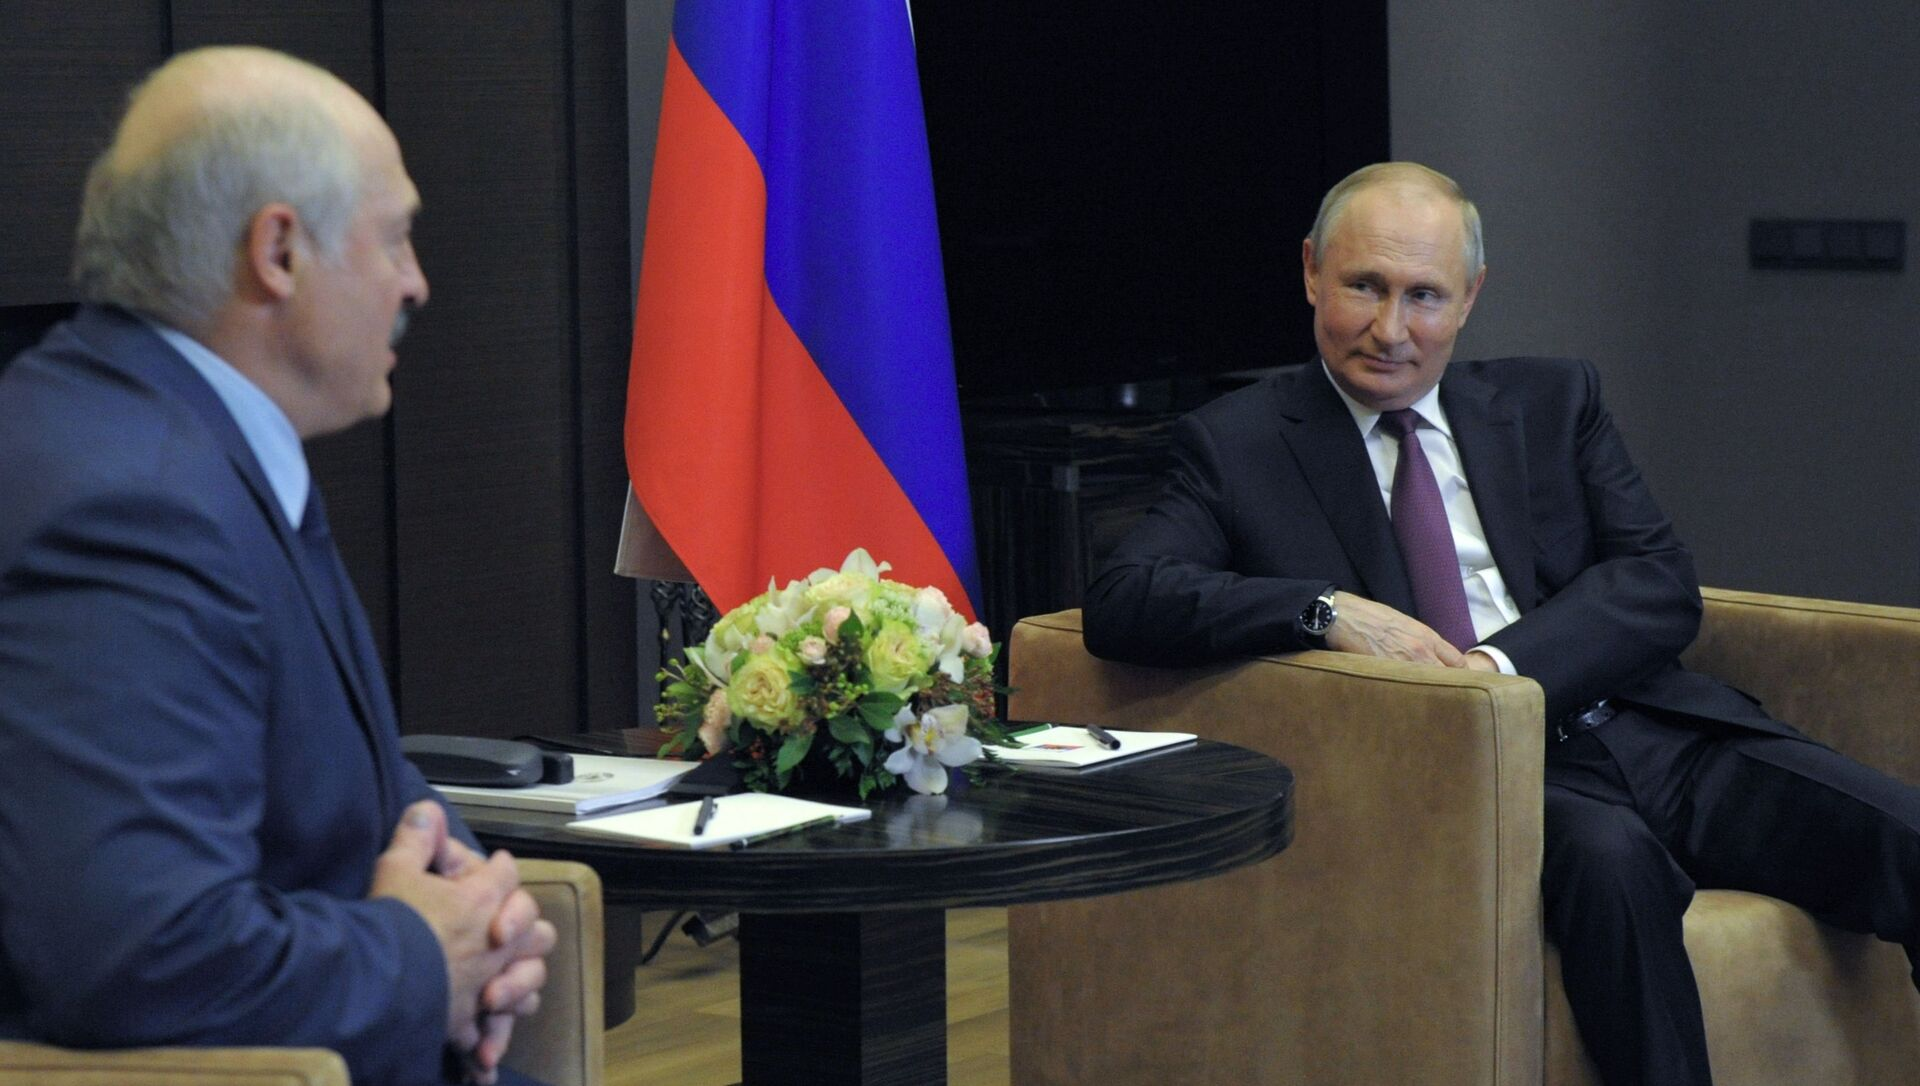 Президент РФ В. Путин встретился с президентом Белоруссии А. Лукашенко - Sputnik Беларусь, 1920, 28.05.2021